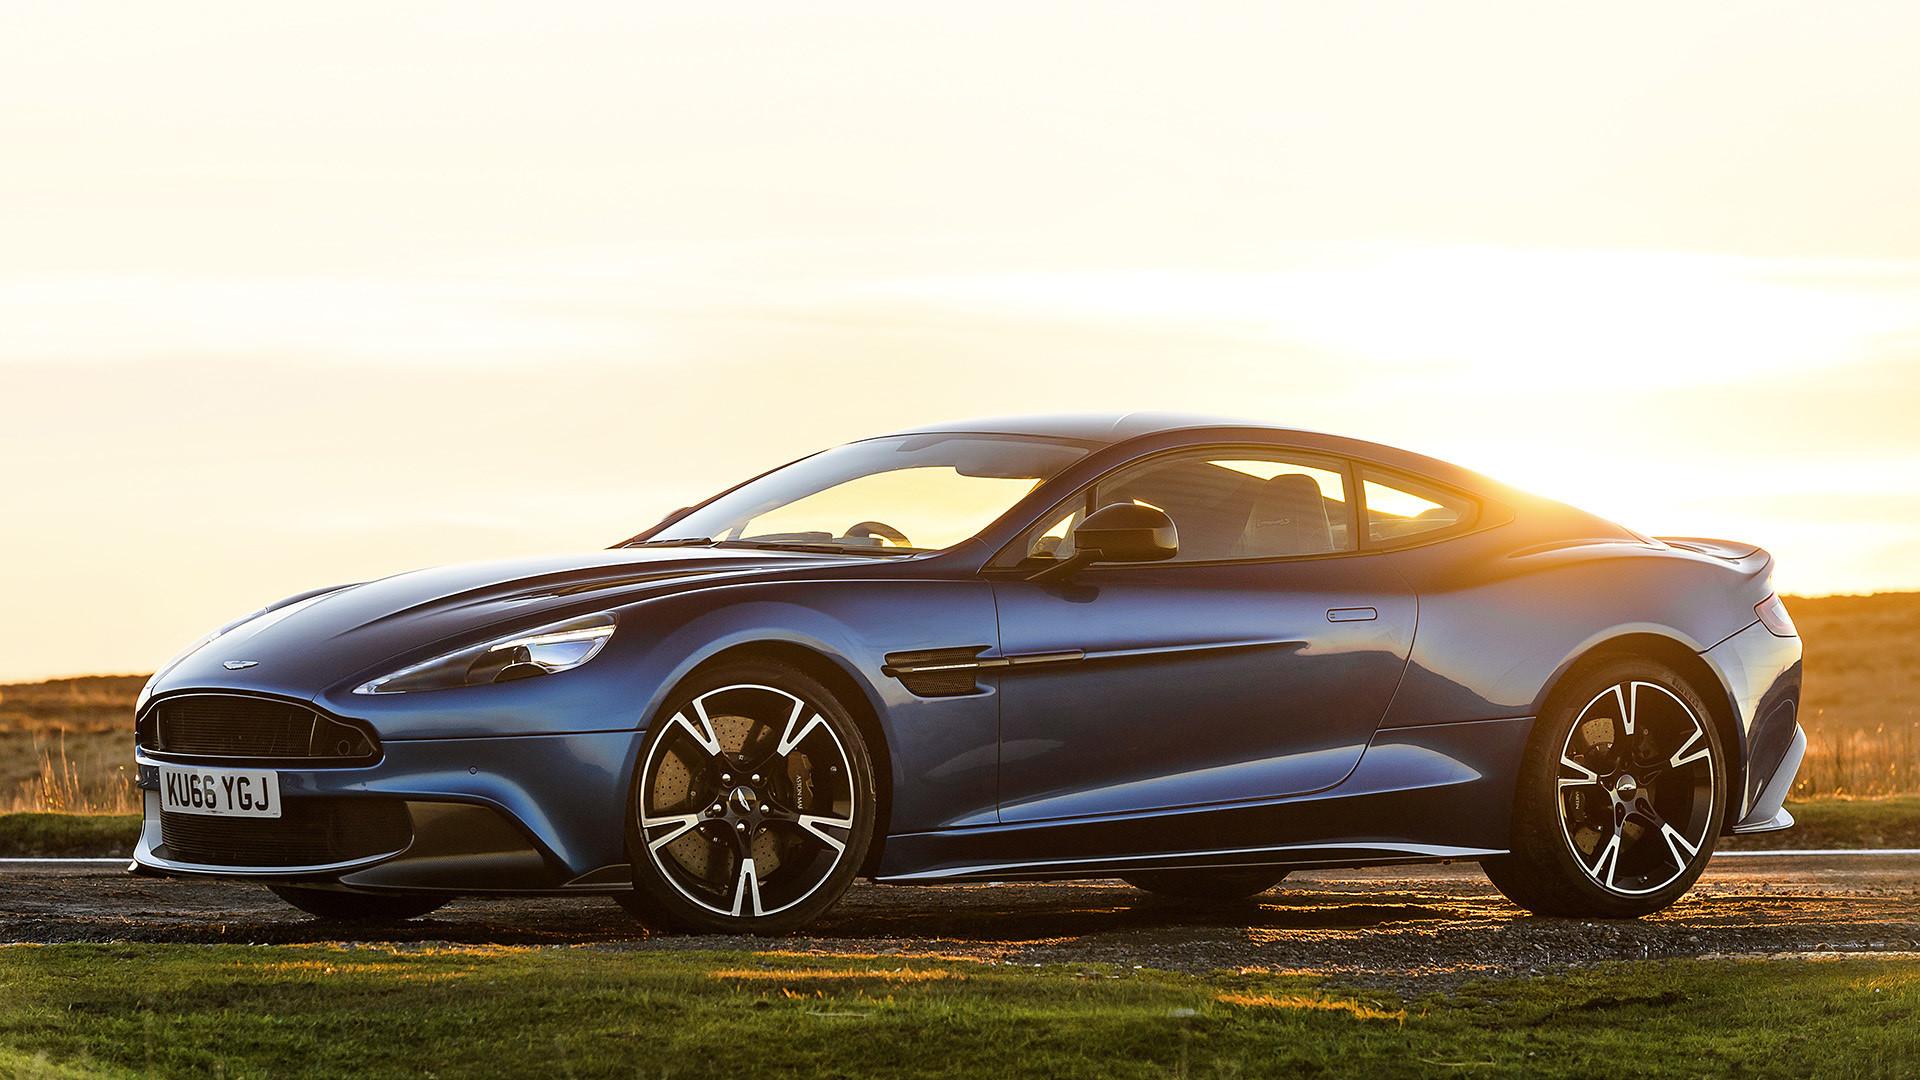 Aston Martin Vanquish 2018 Wallpaper 62 images 1920x1080